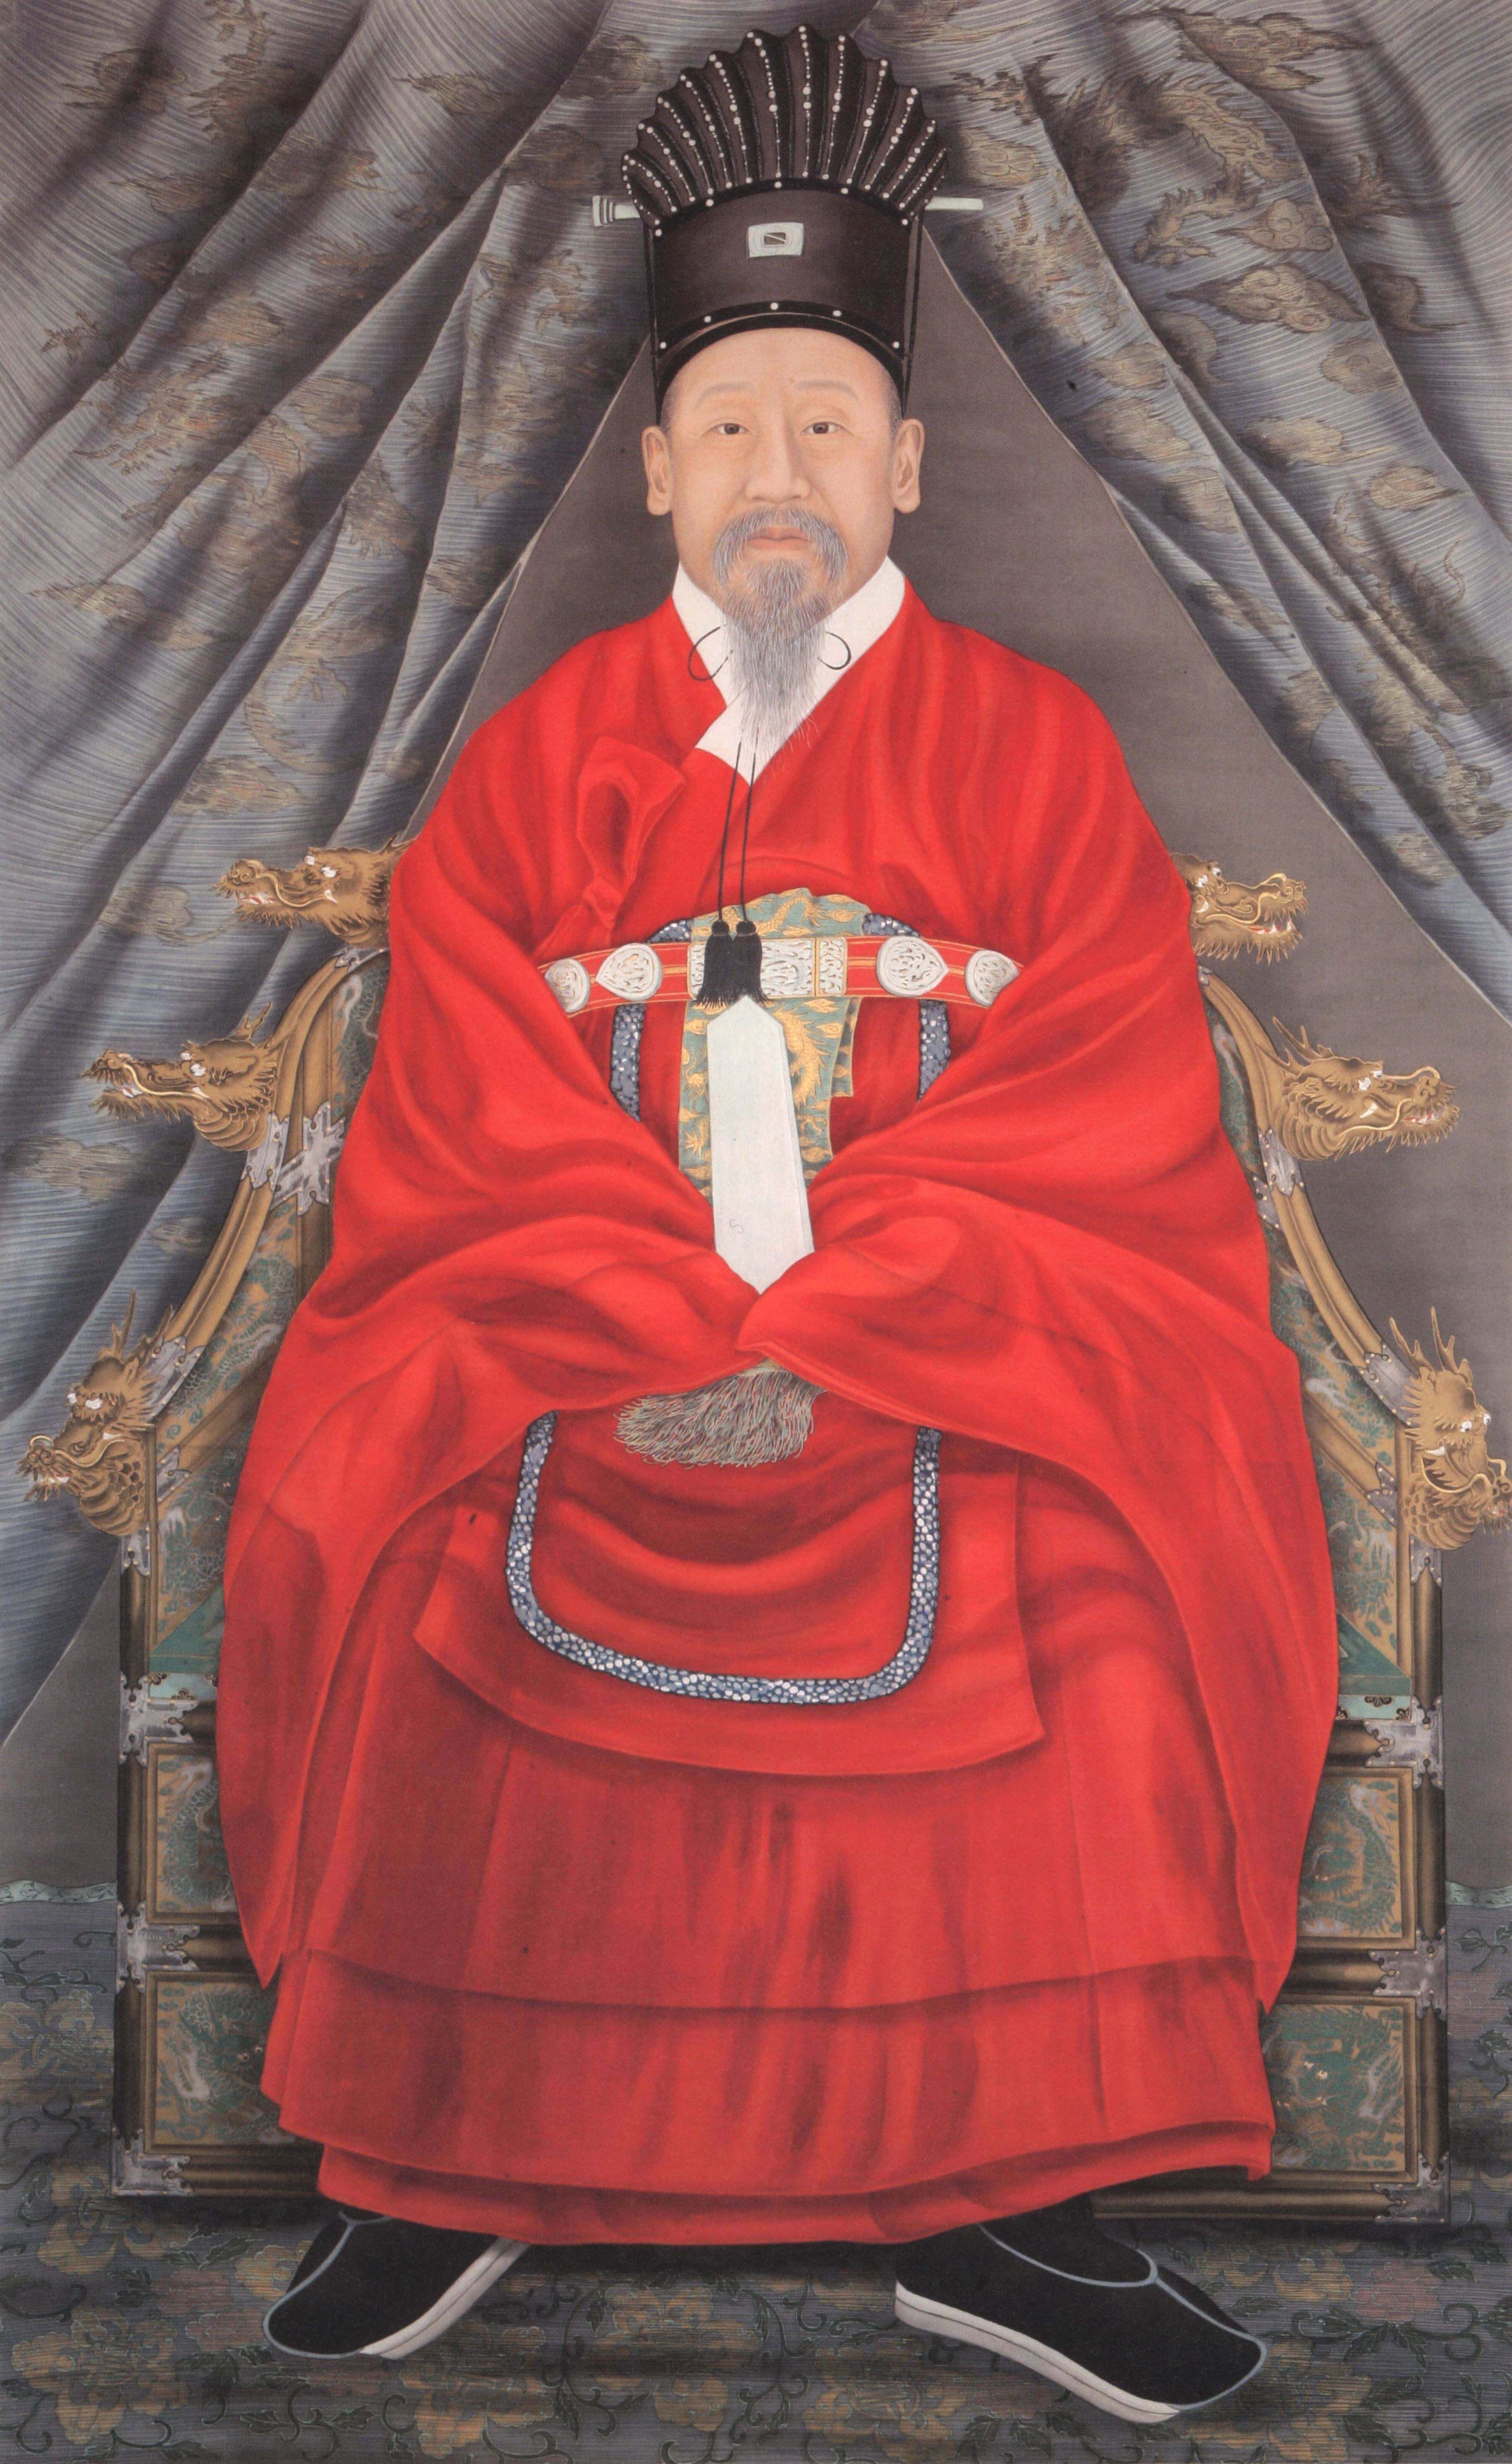 cc26d0c76 Portrait of Gojong (Emperor Gwangmu) of the Yi Dynasty, Joseon Korea ...